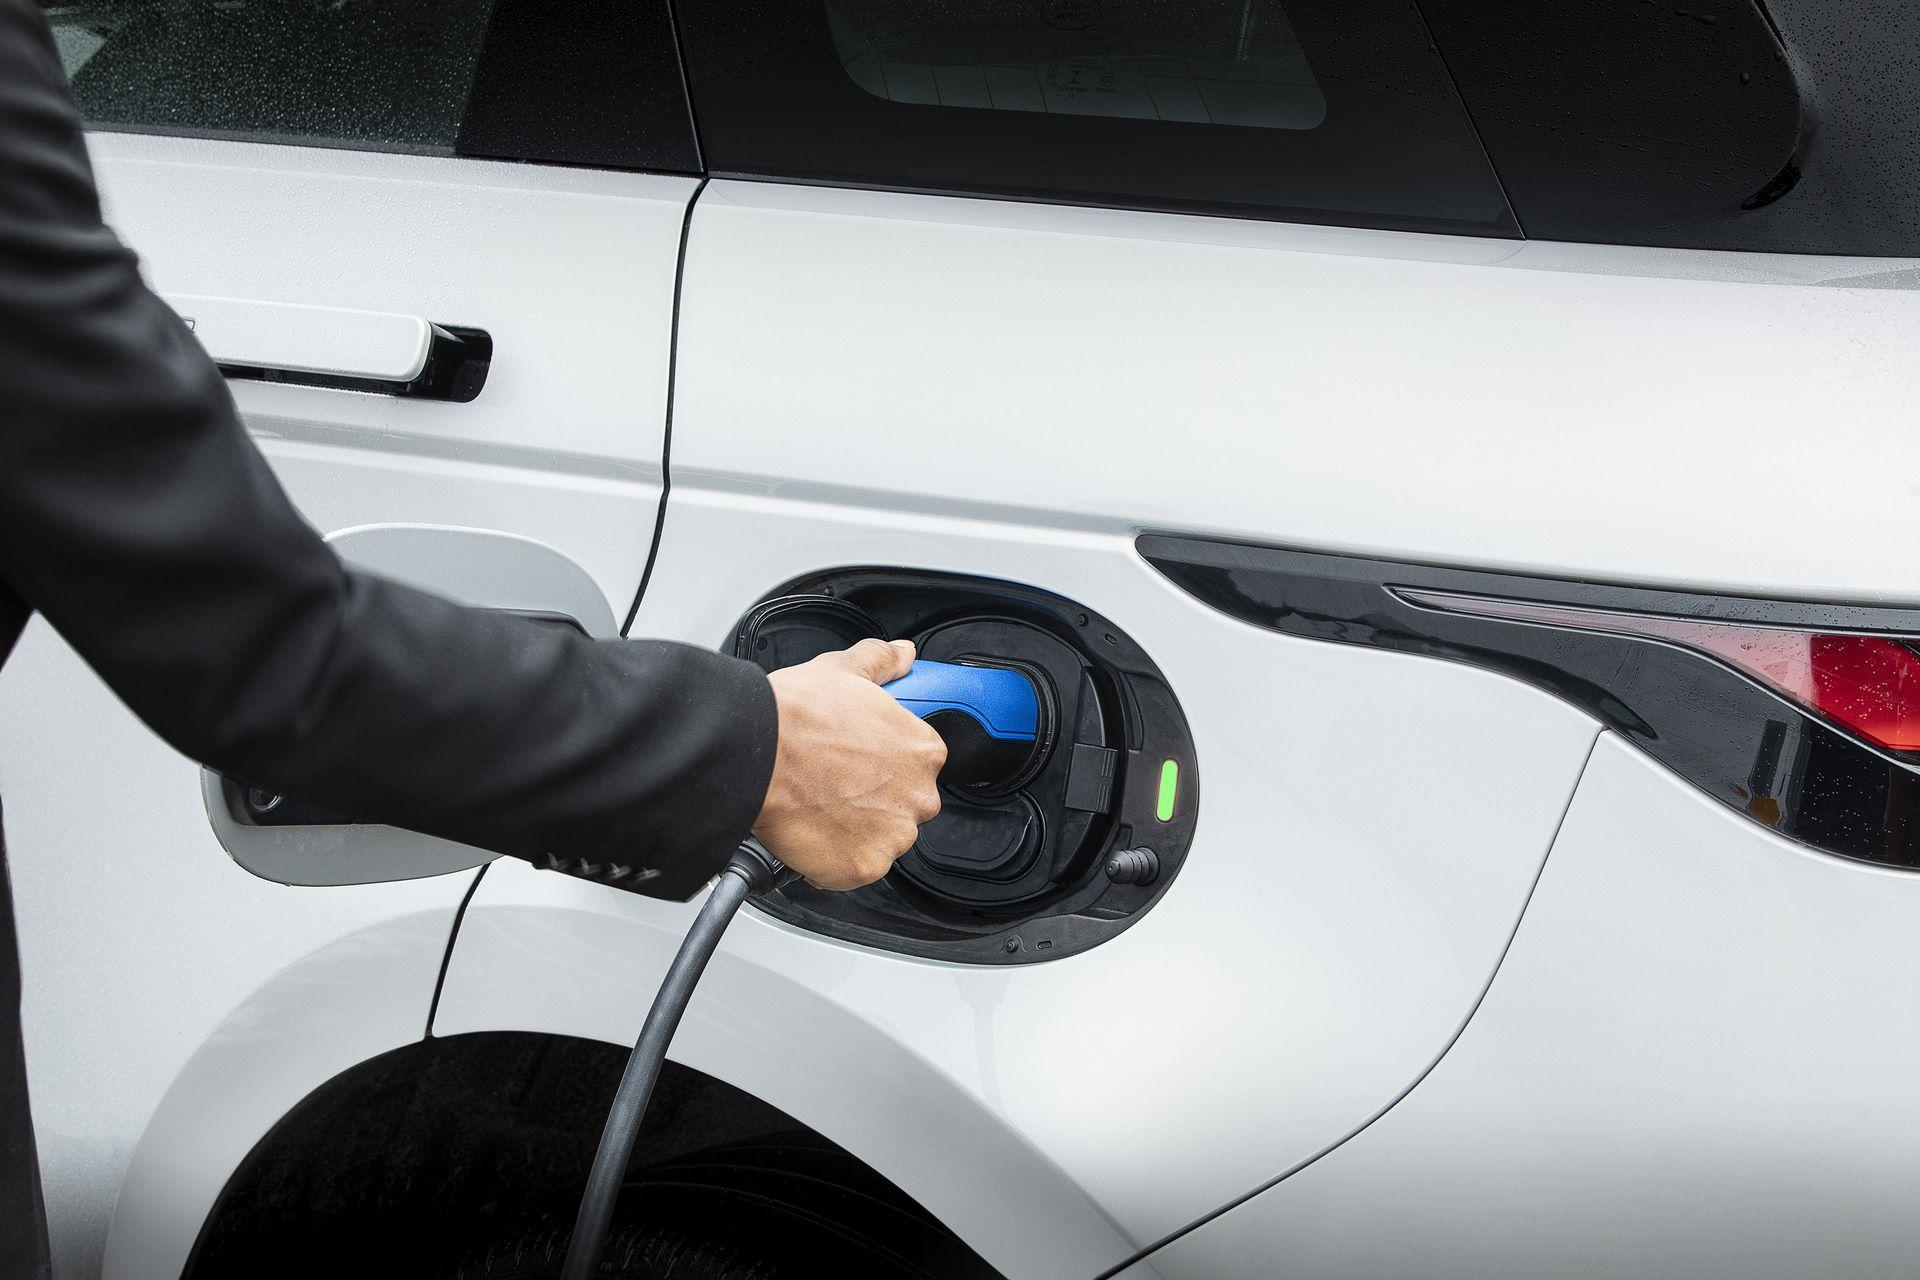 Plug-in-hybrid-Rabge-Rover-Evoque-PHEV-9